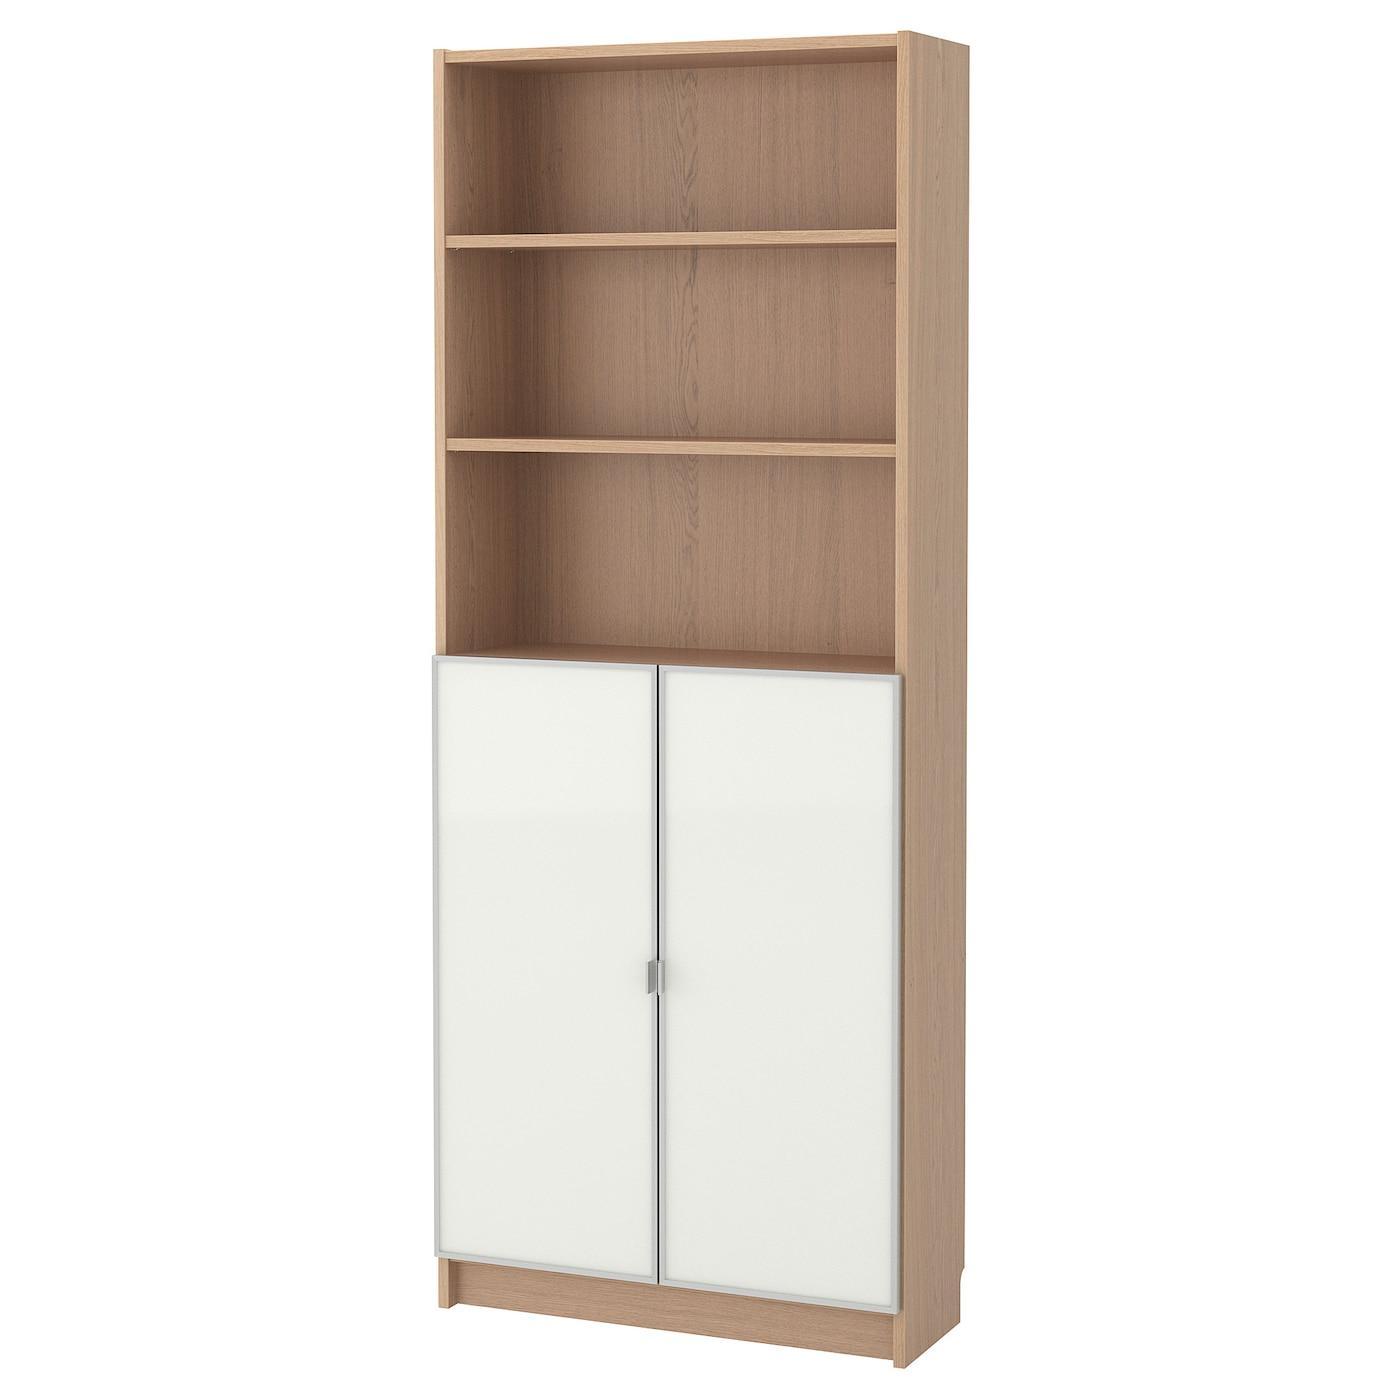 Bücherregal Ikea Billy Regal Weiß